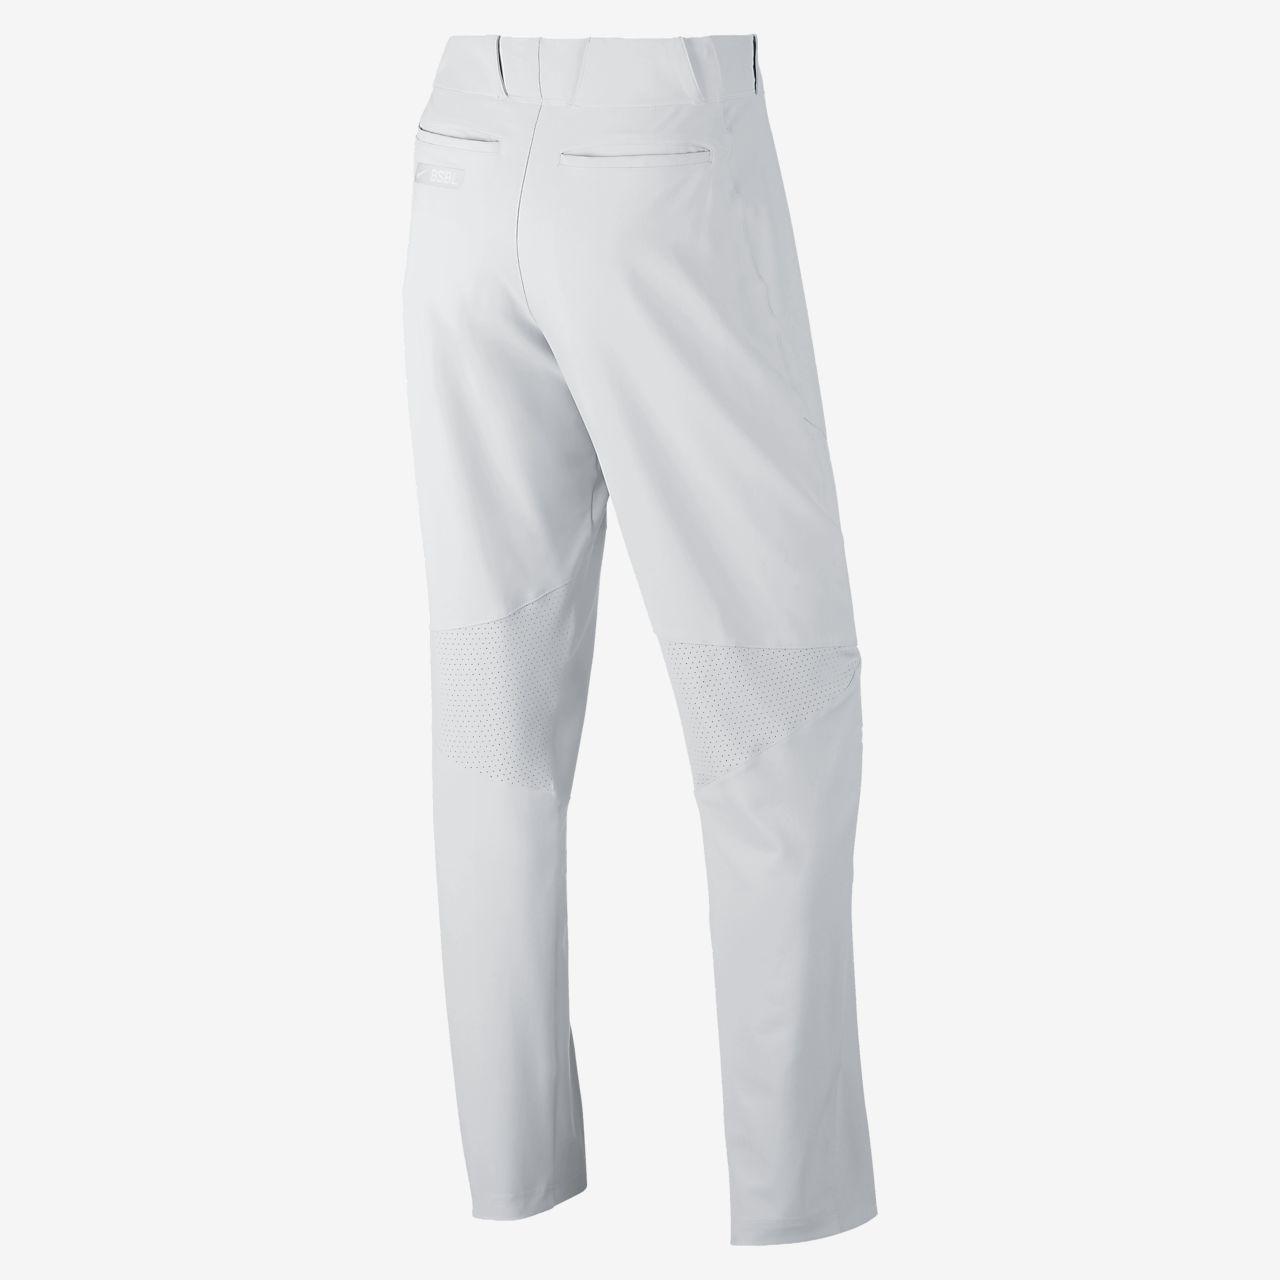 ... Nike Vapor Elite Men's Baseball Pants